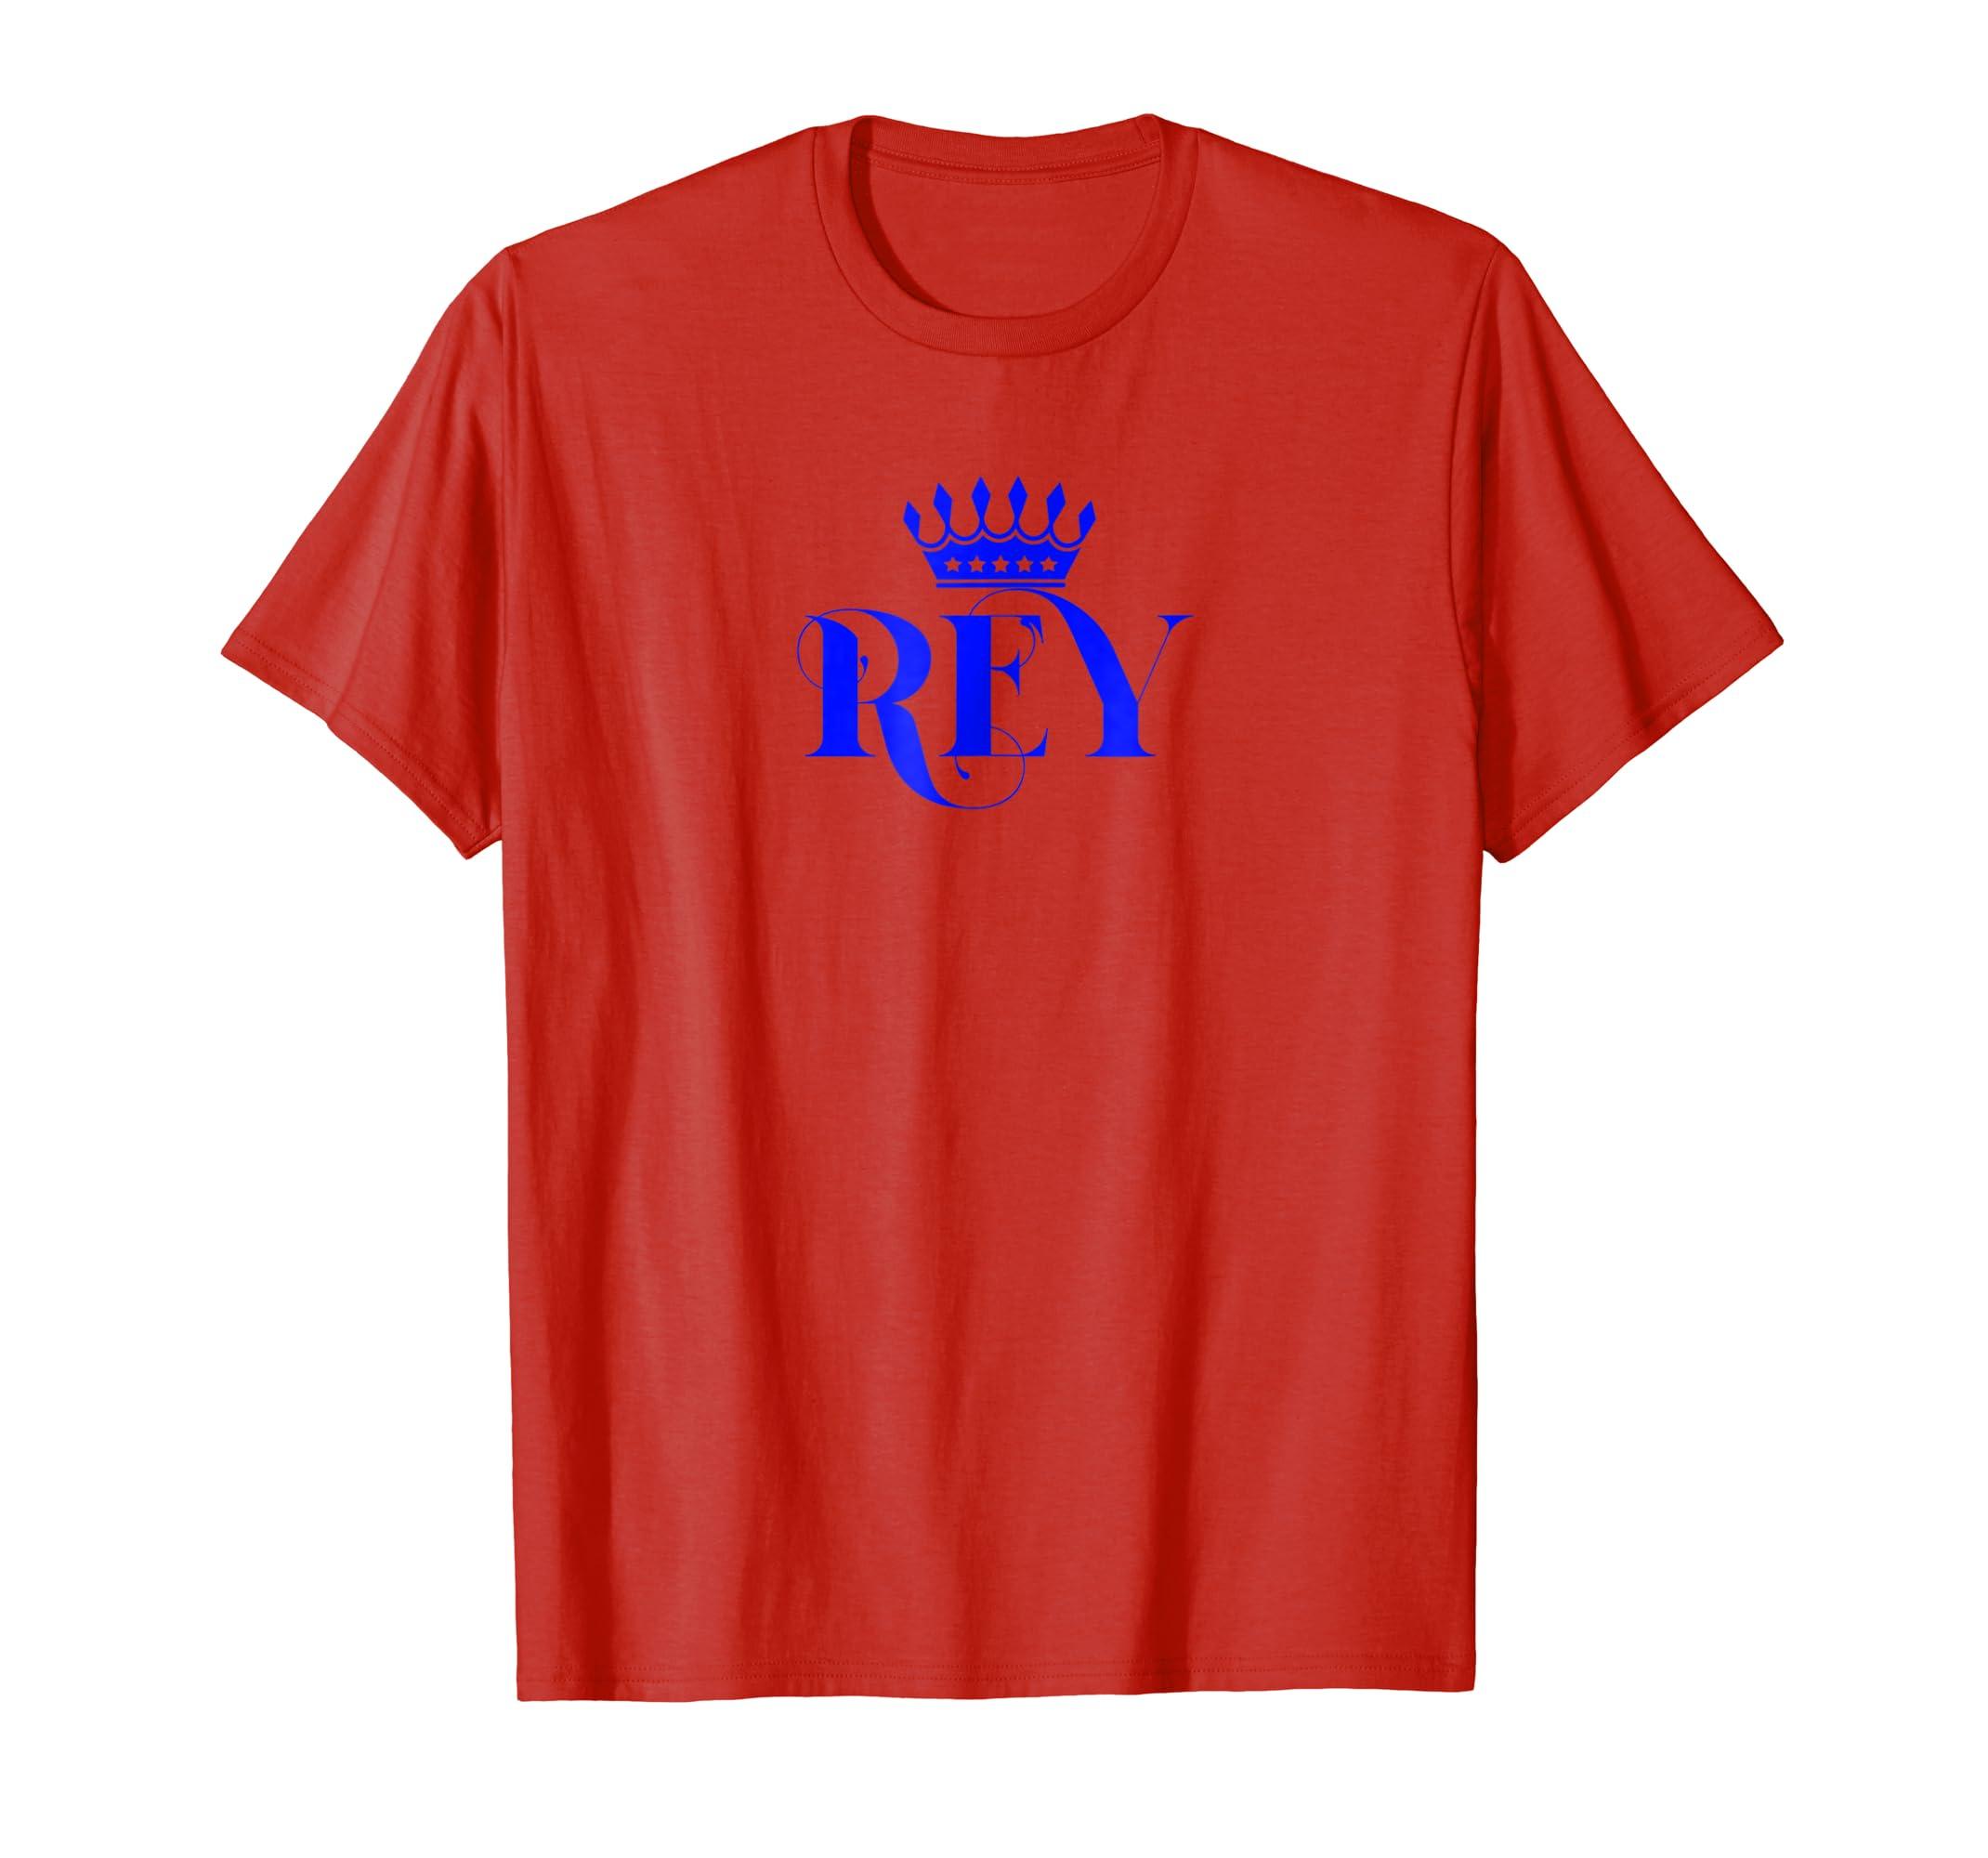 Amazon.com: Rey Camisa King Tshirt Dad Father Papa Regalo Gift Men: Clothing